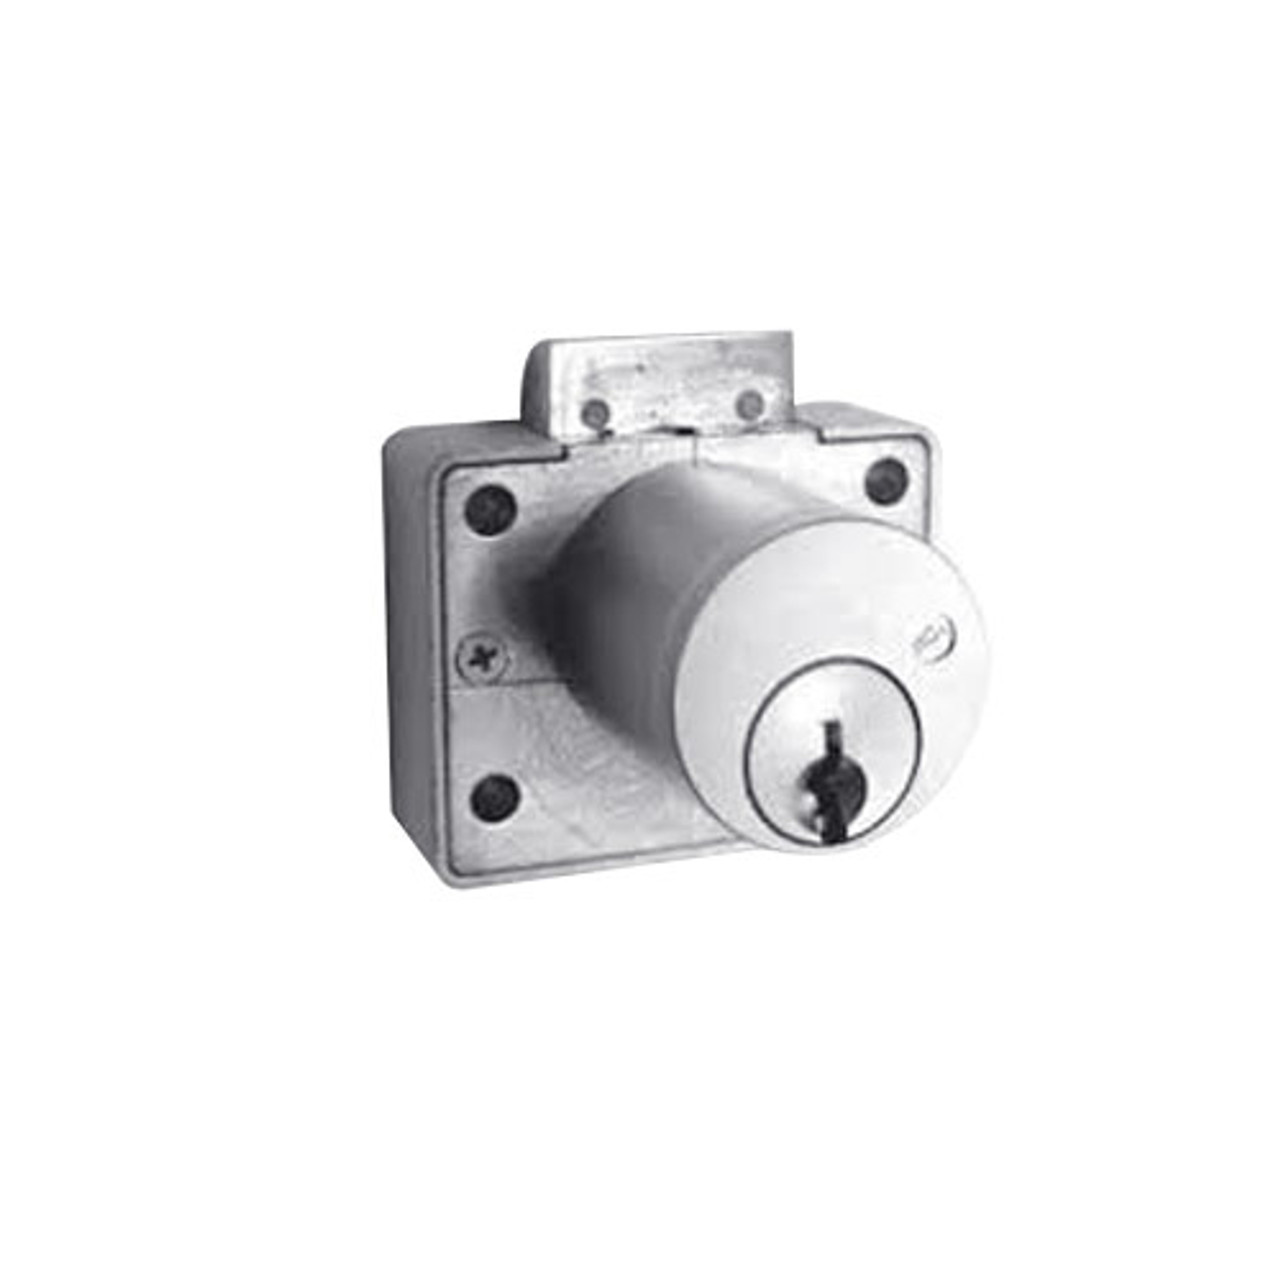 Olympus L78V-VH-KD-26D-1-3/8 Drawer Latch Cabinet Lock in Satin Chrome Finish